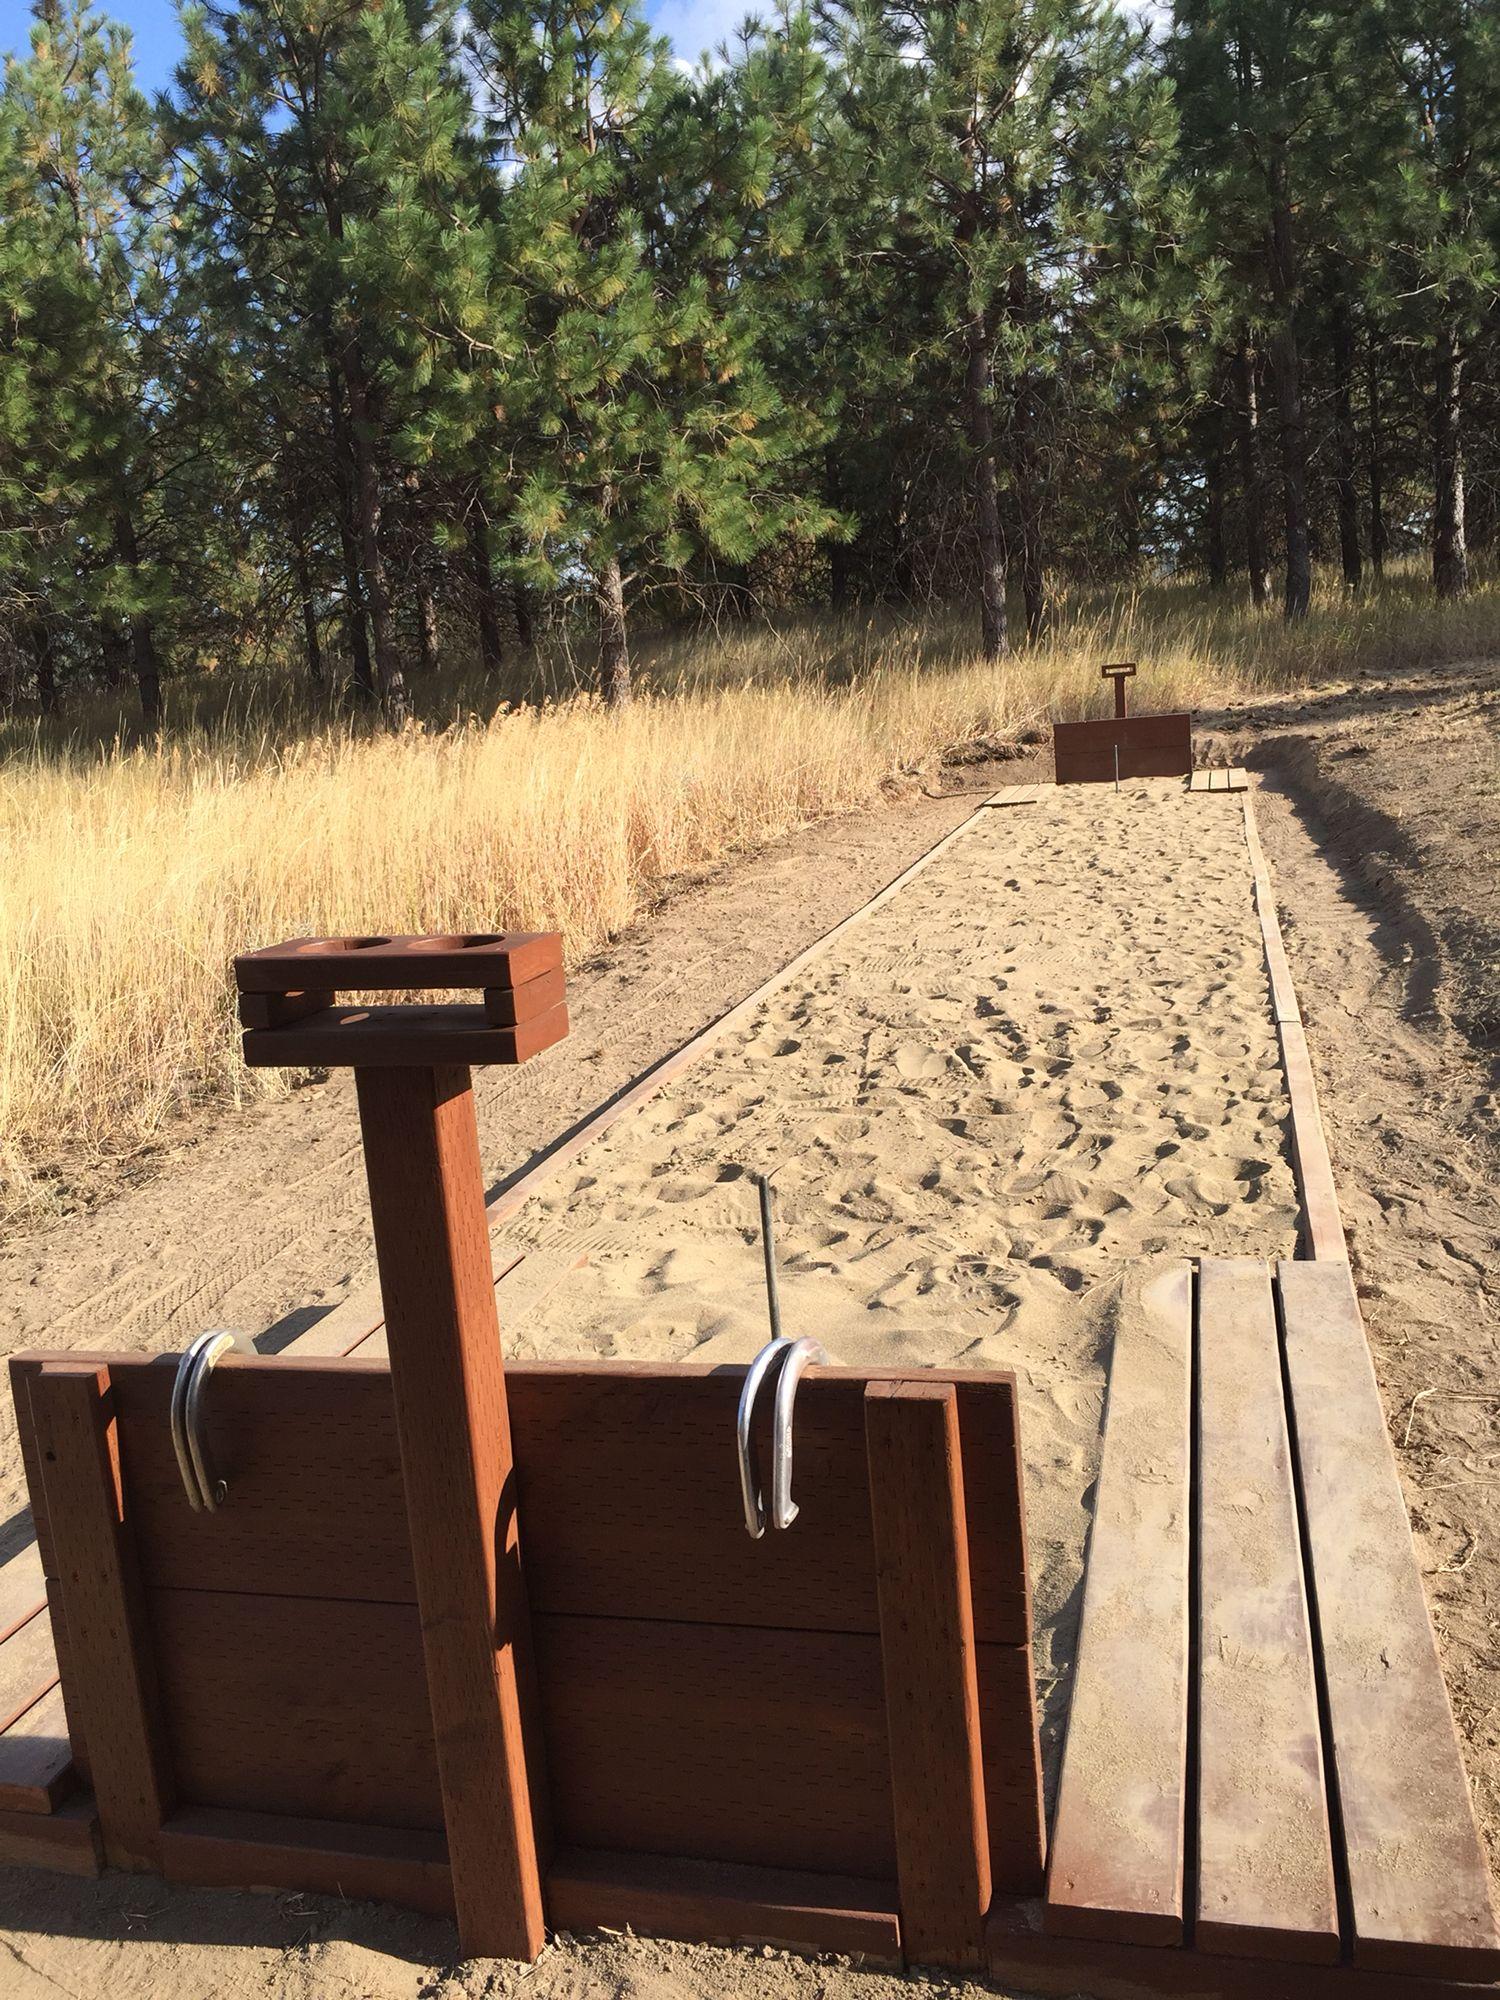 Horseshoe pit. | Horseshoe pit, Backyard projects ...